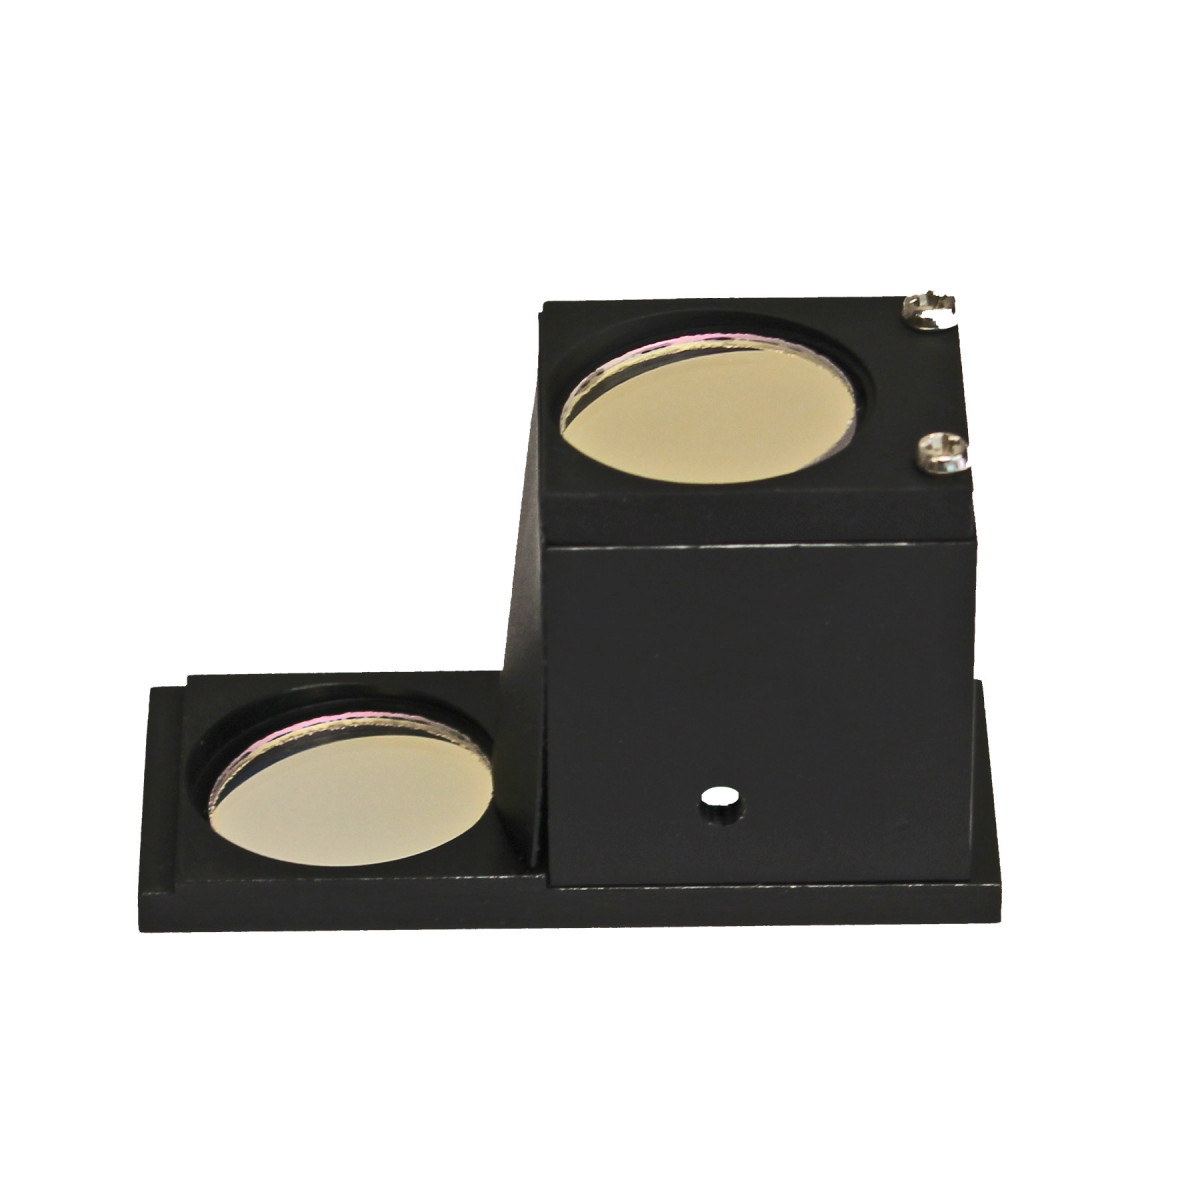 DAPI Filter Set for Z10 Series